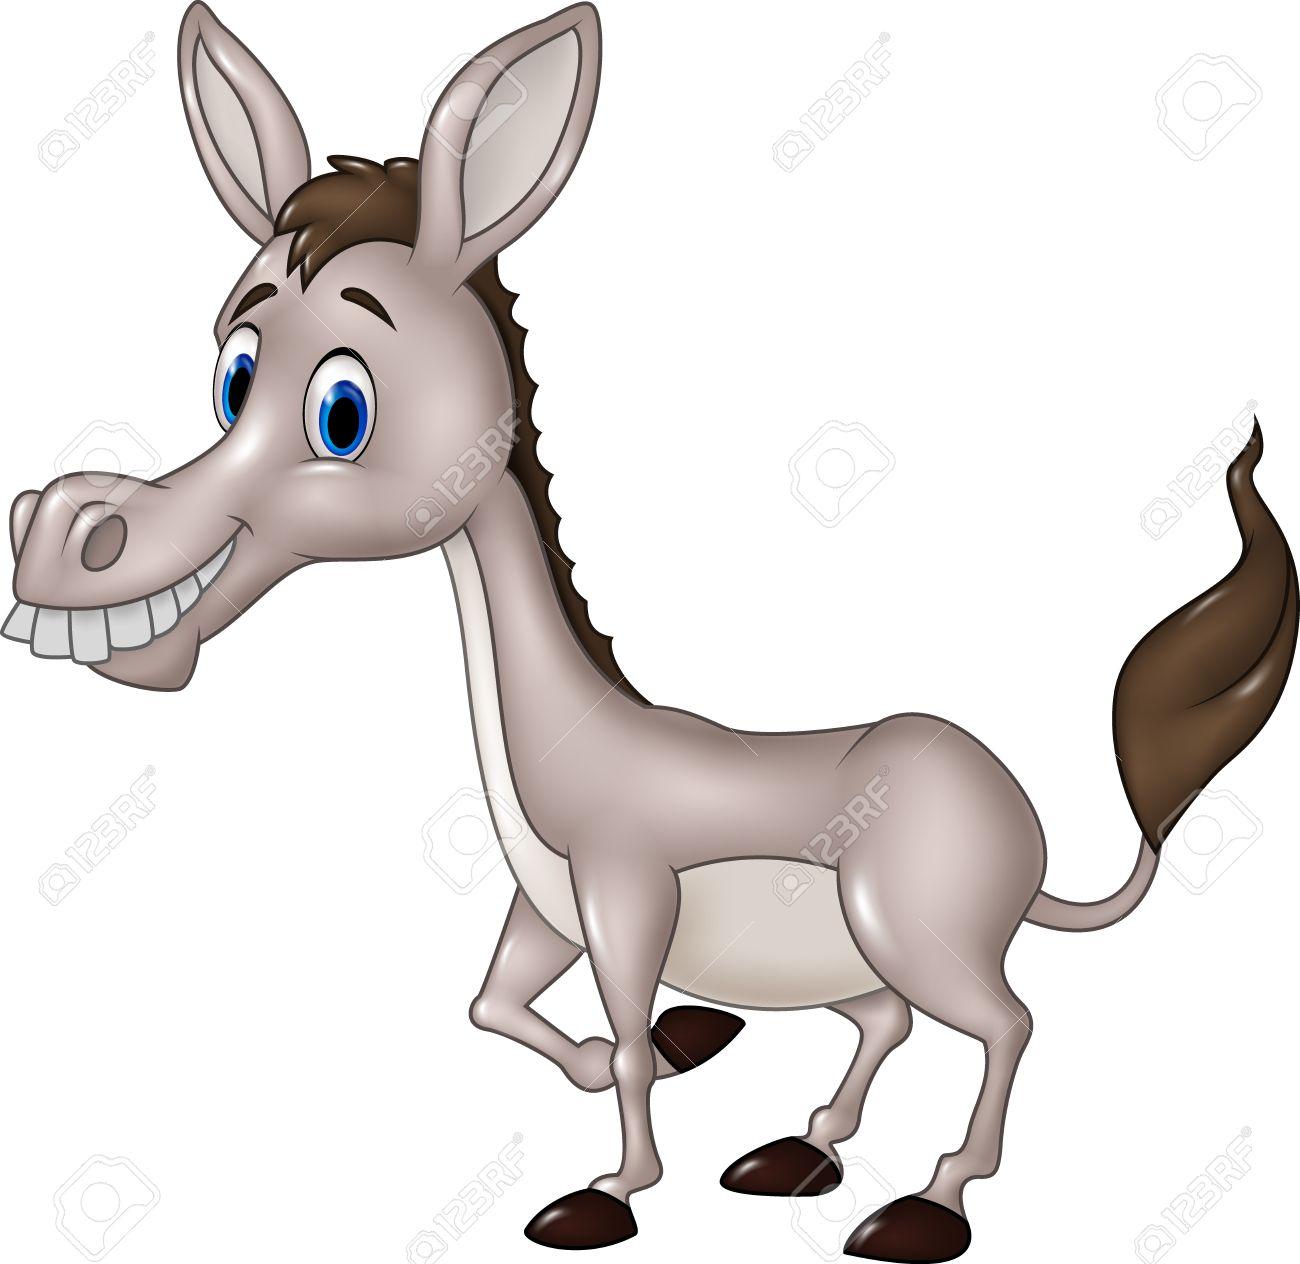 1300x1264 Vector Illustration Of Cartoon Funny Donkey Isolated On White